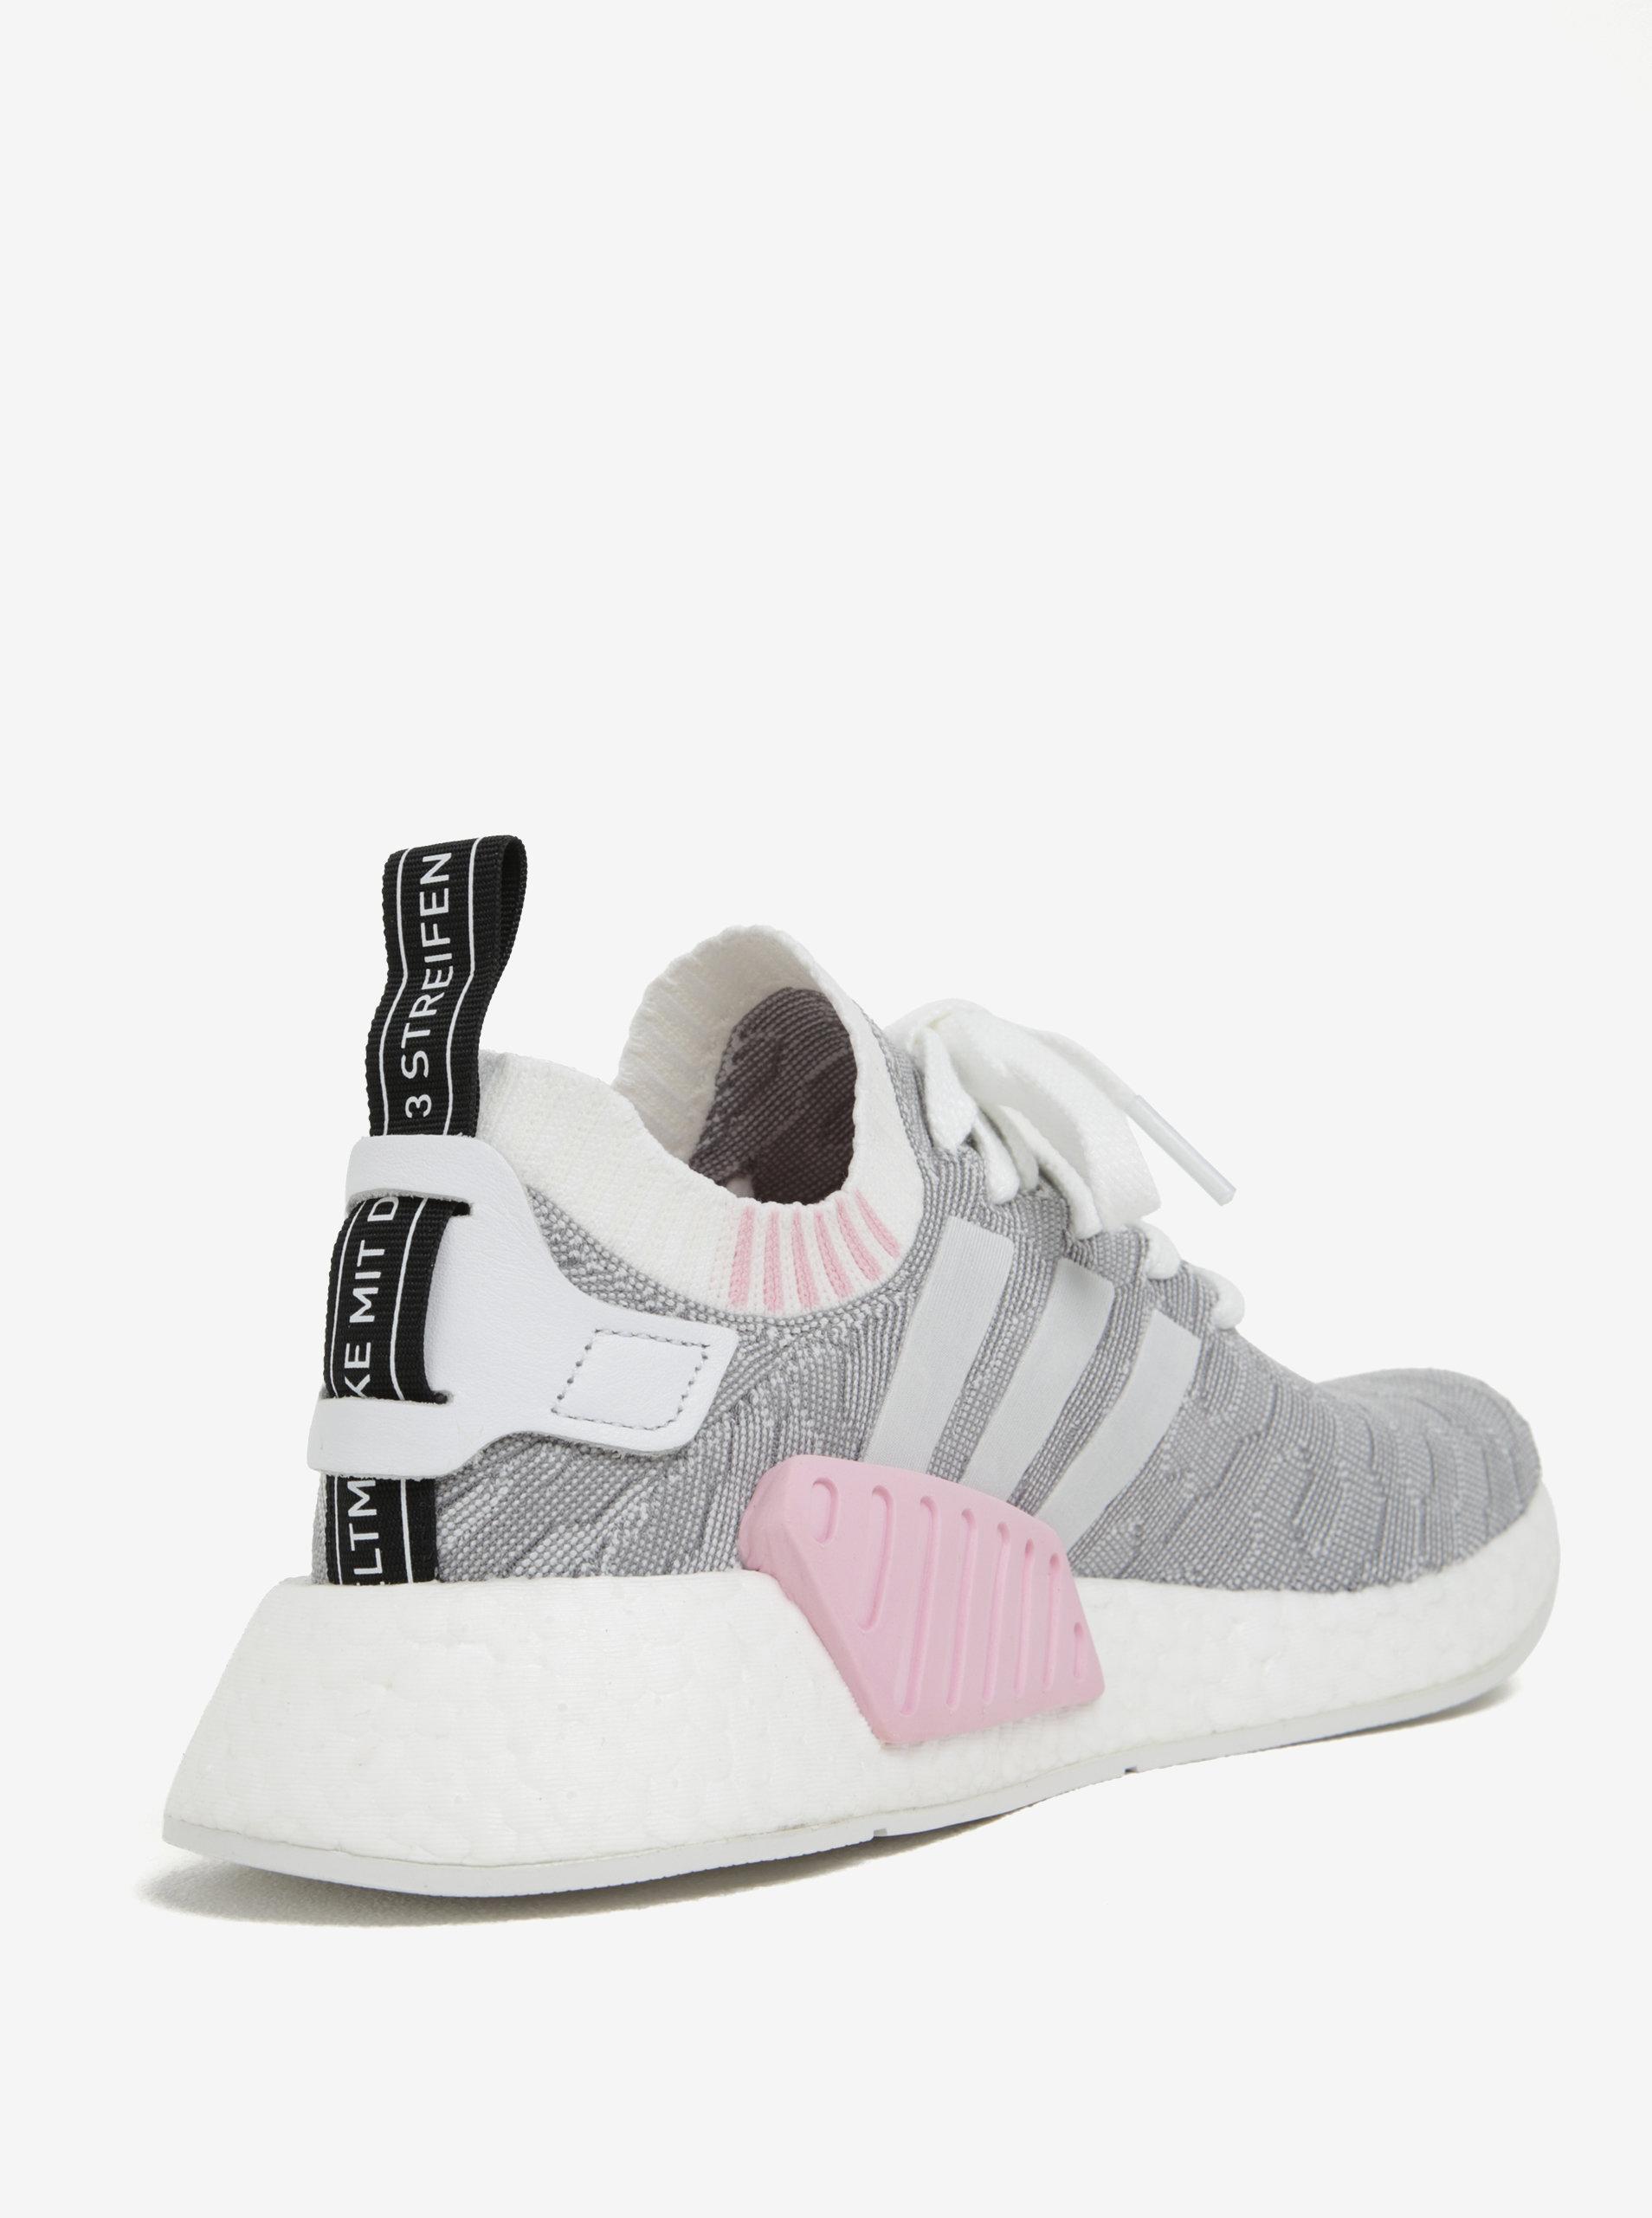 1d70e508453aa Sivé dámske vzorované tenisky adidas Originals NMD | ZOOT.sk